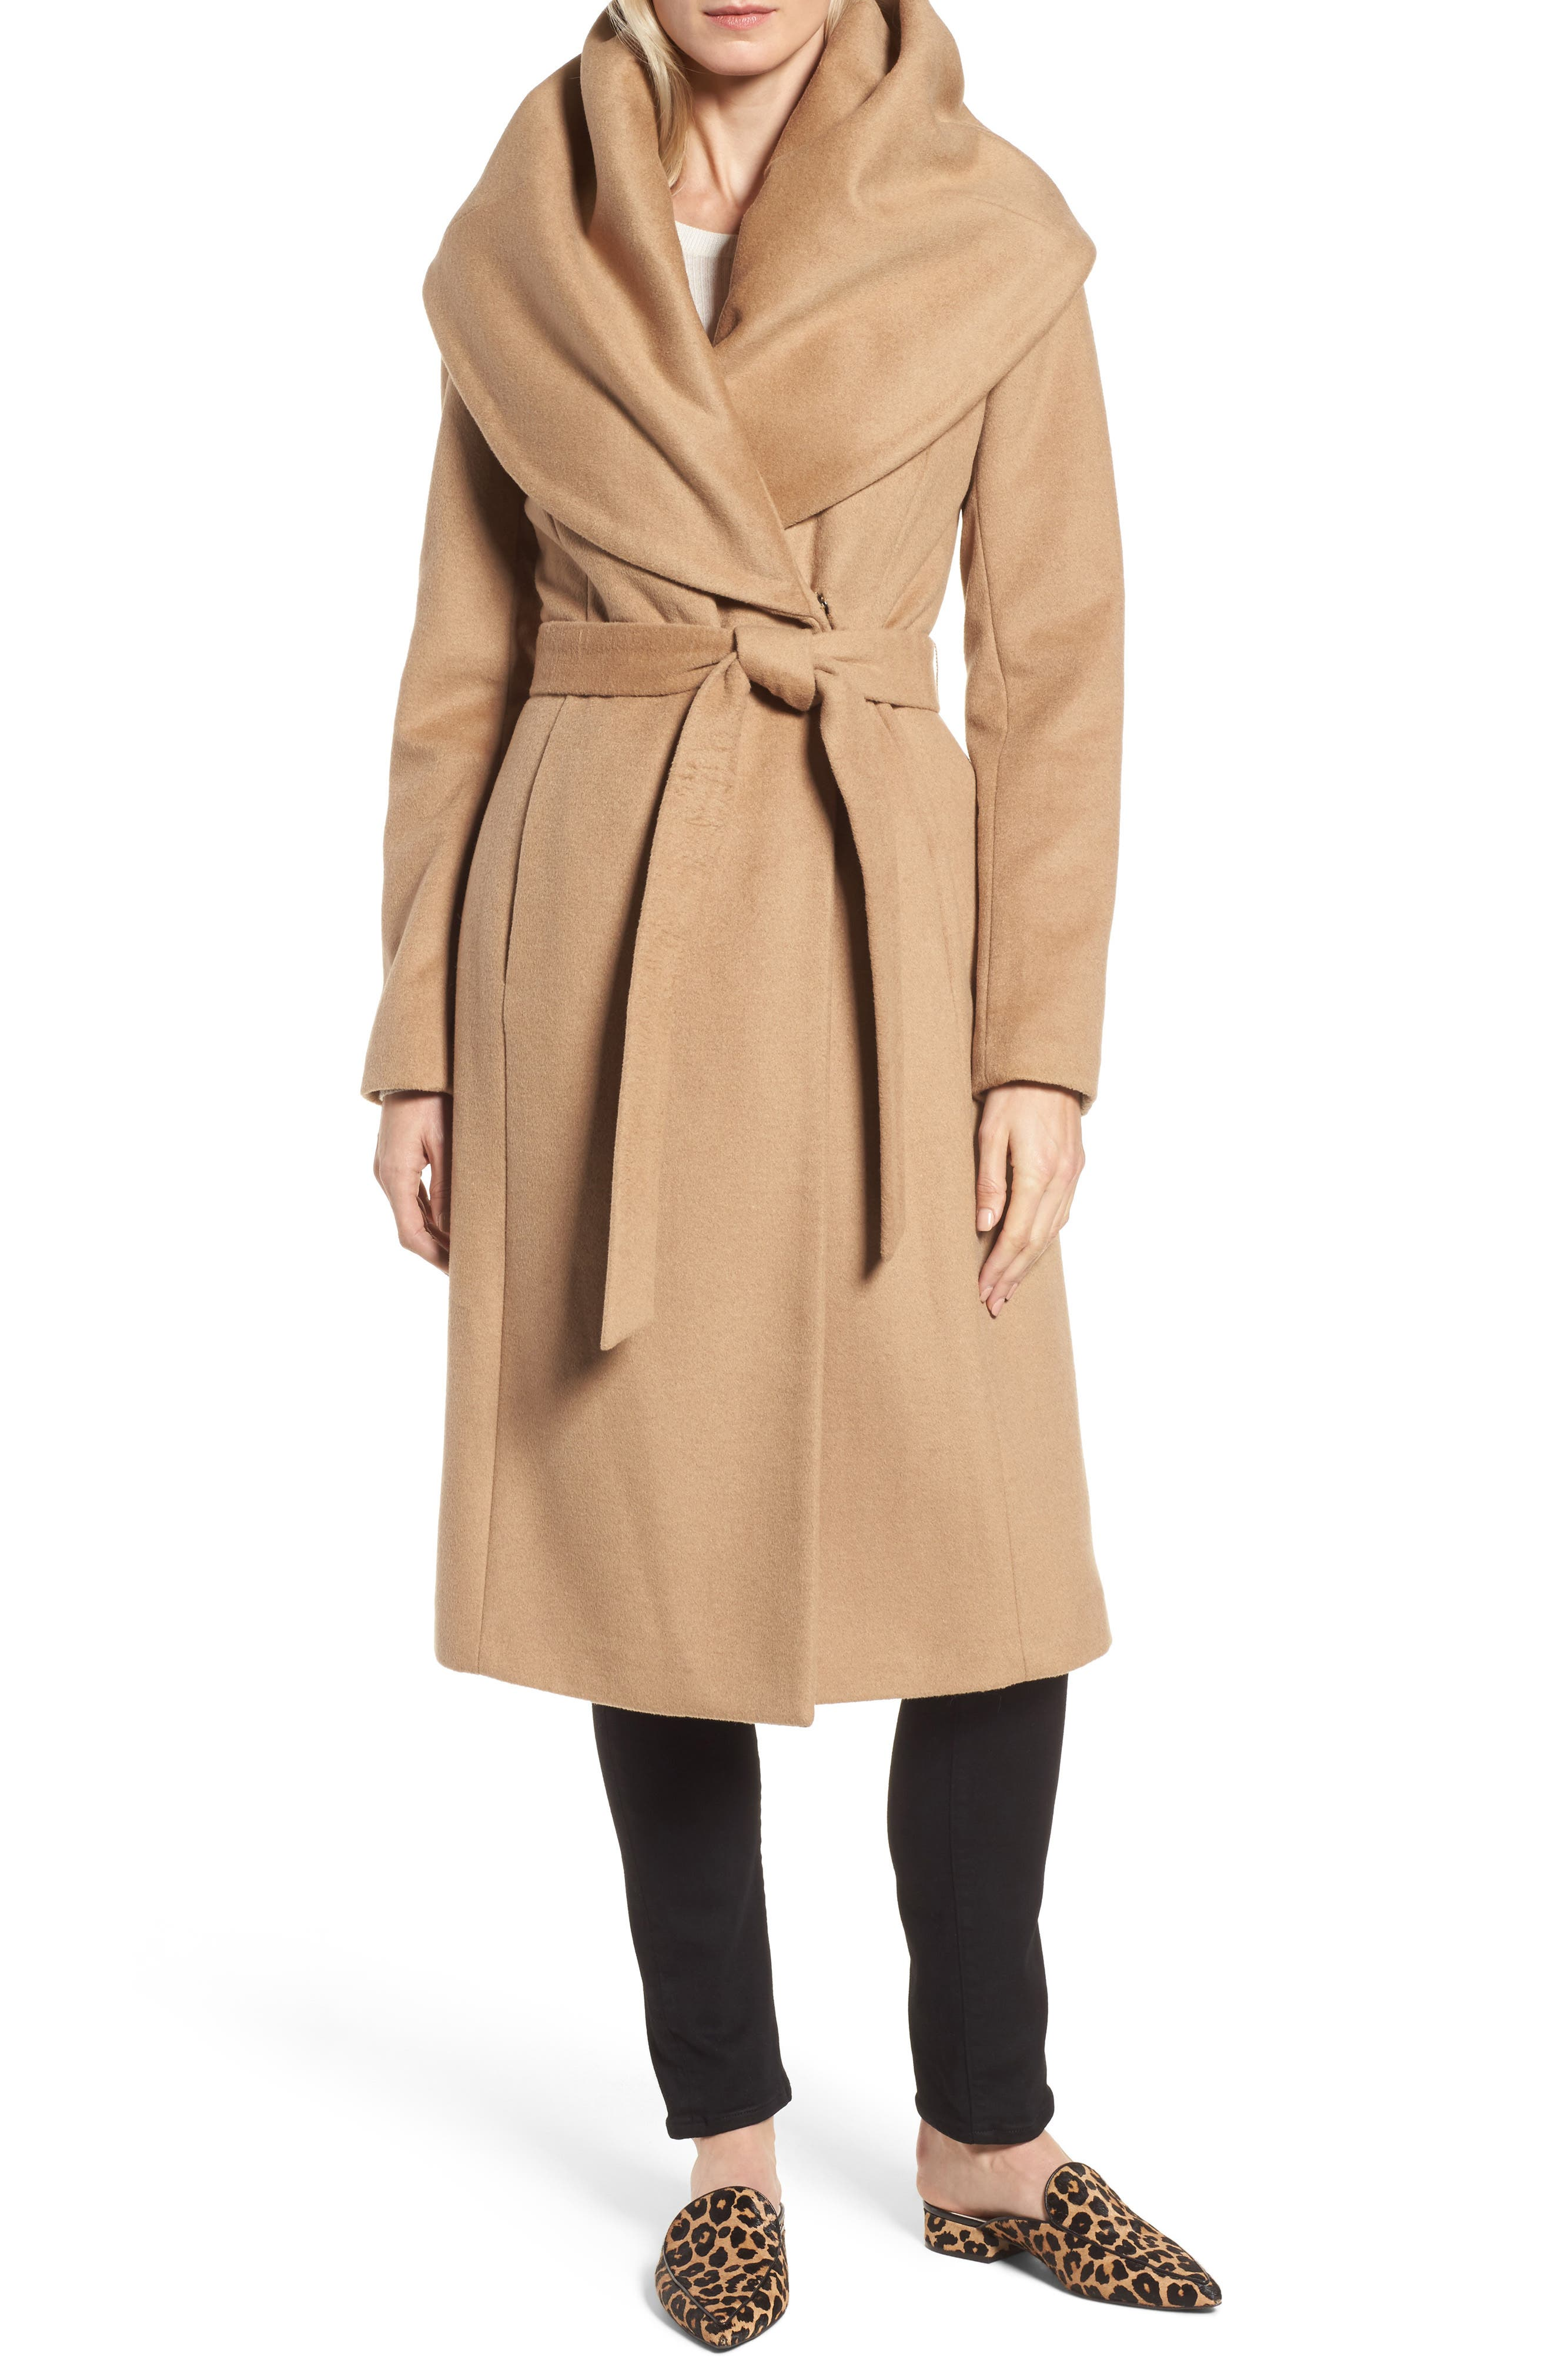 DKNY Wool Blend Shawl Collar Wrap Coat,                             Main thumbnail 1, color,                             Camel